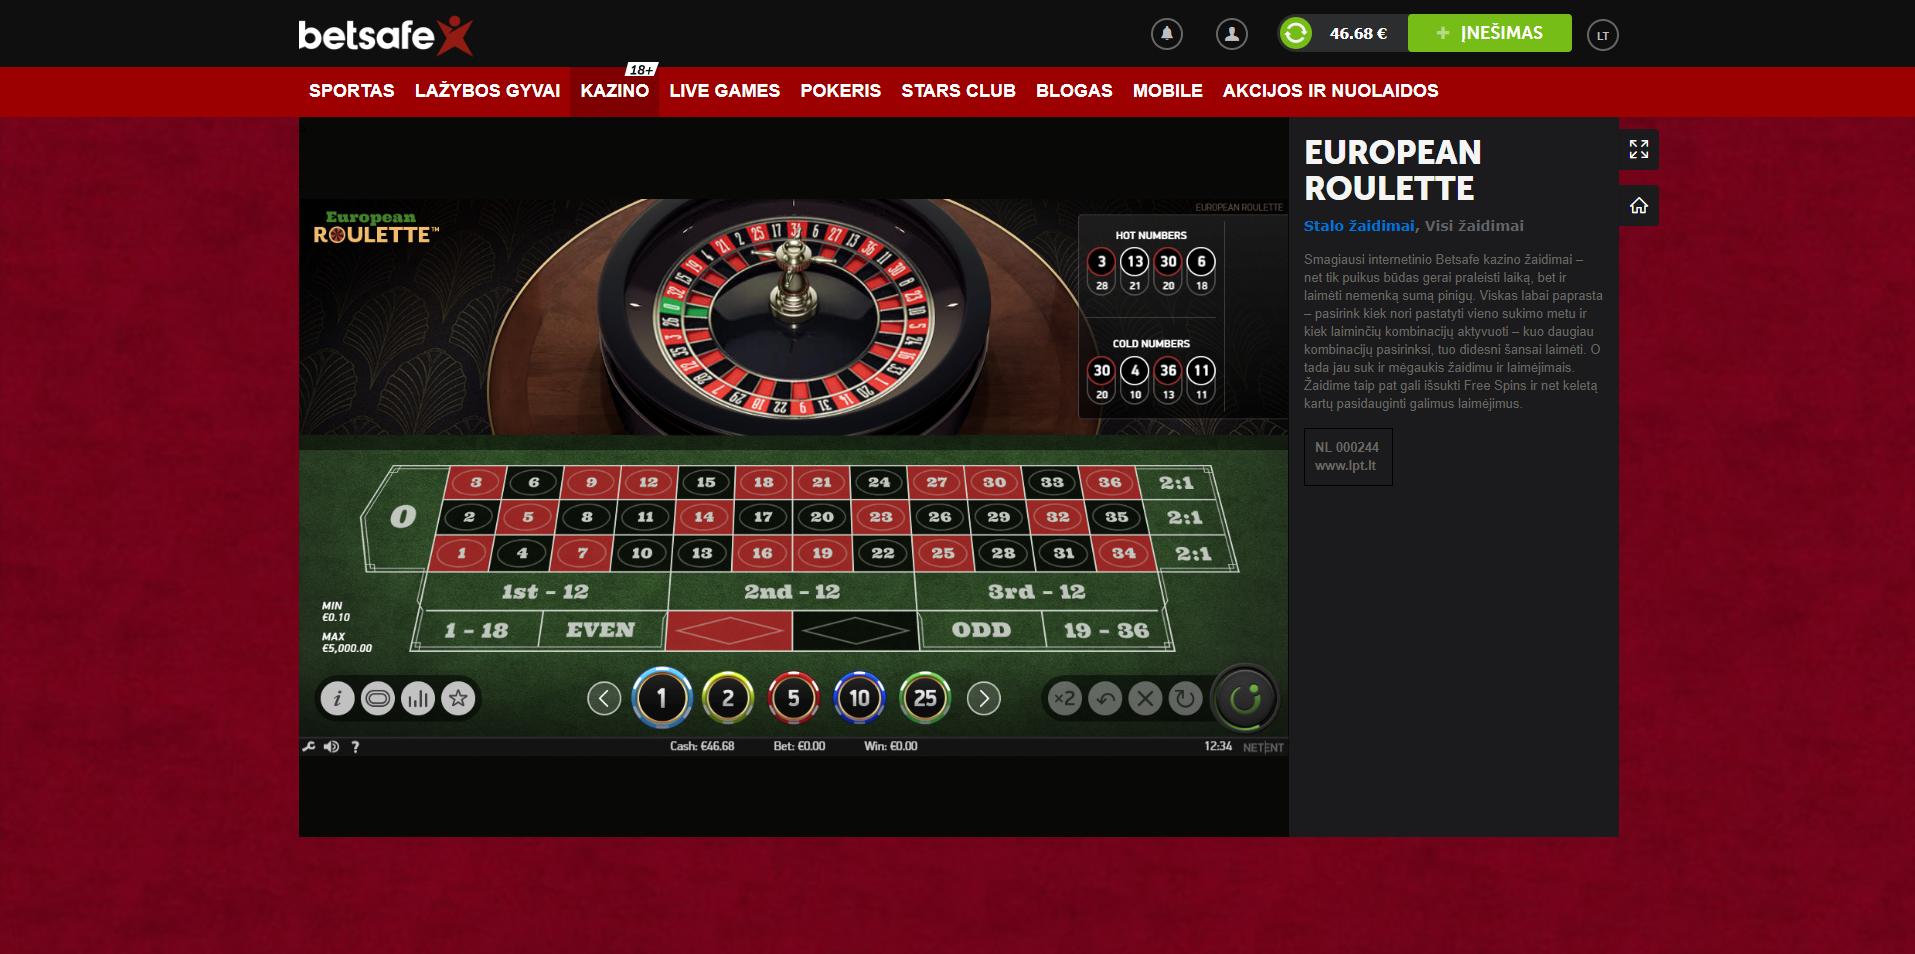 betsafe stalo žaidimai - european roulette - ruletė